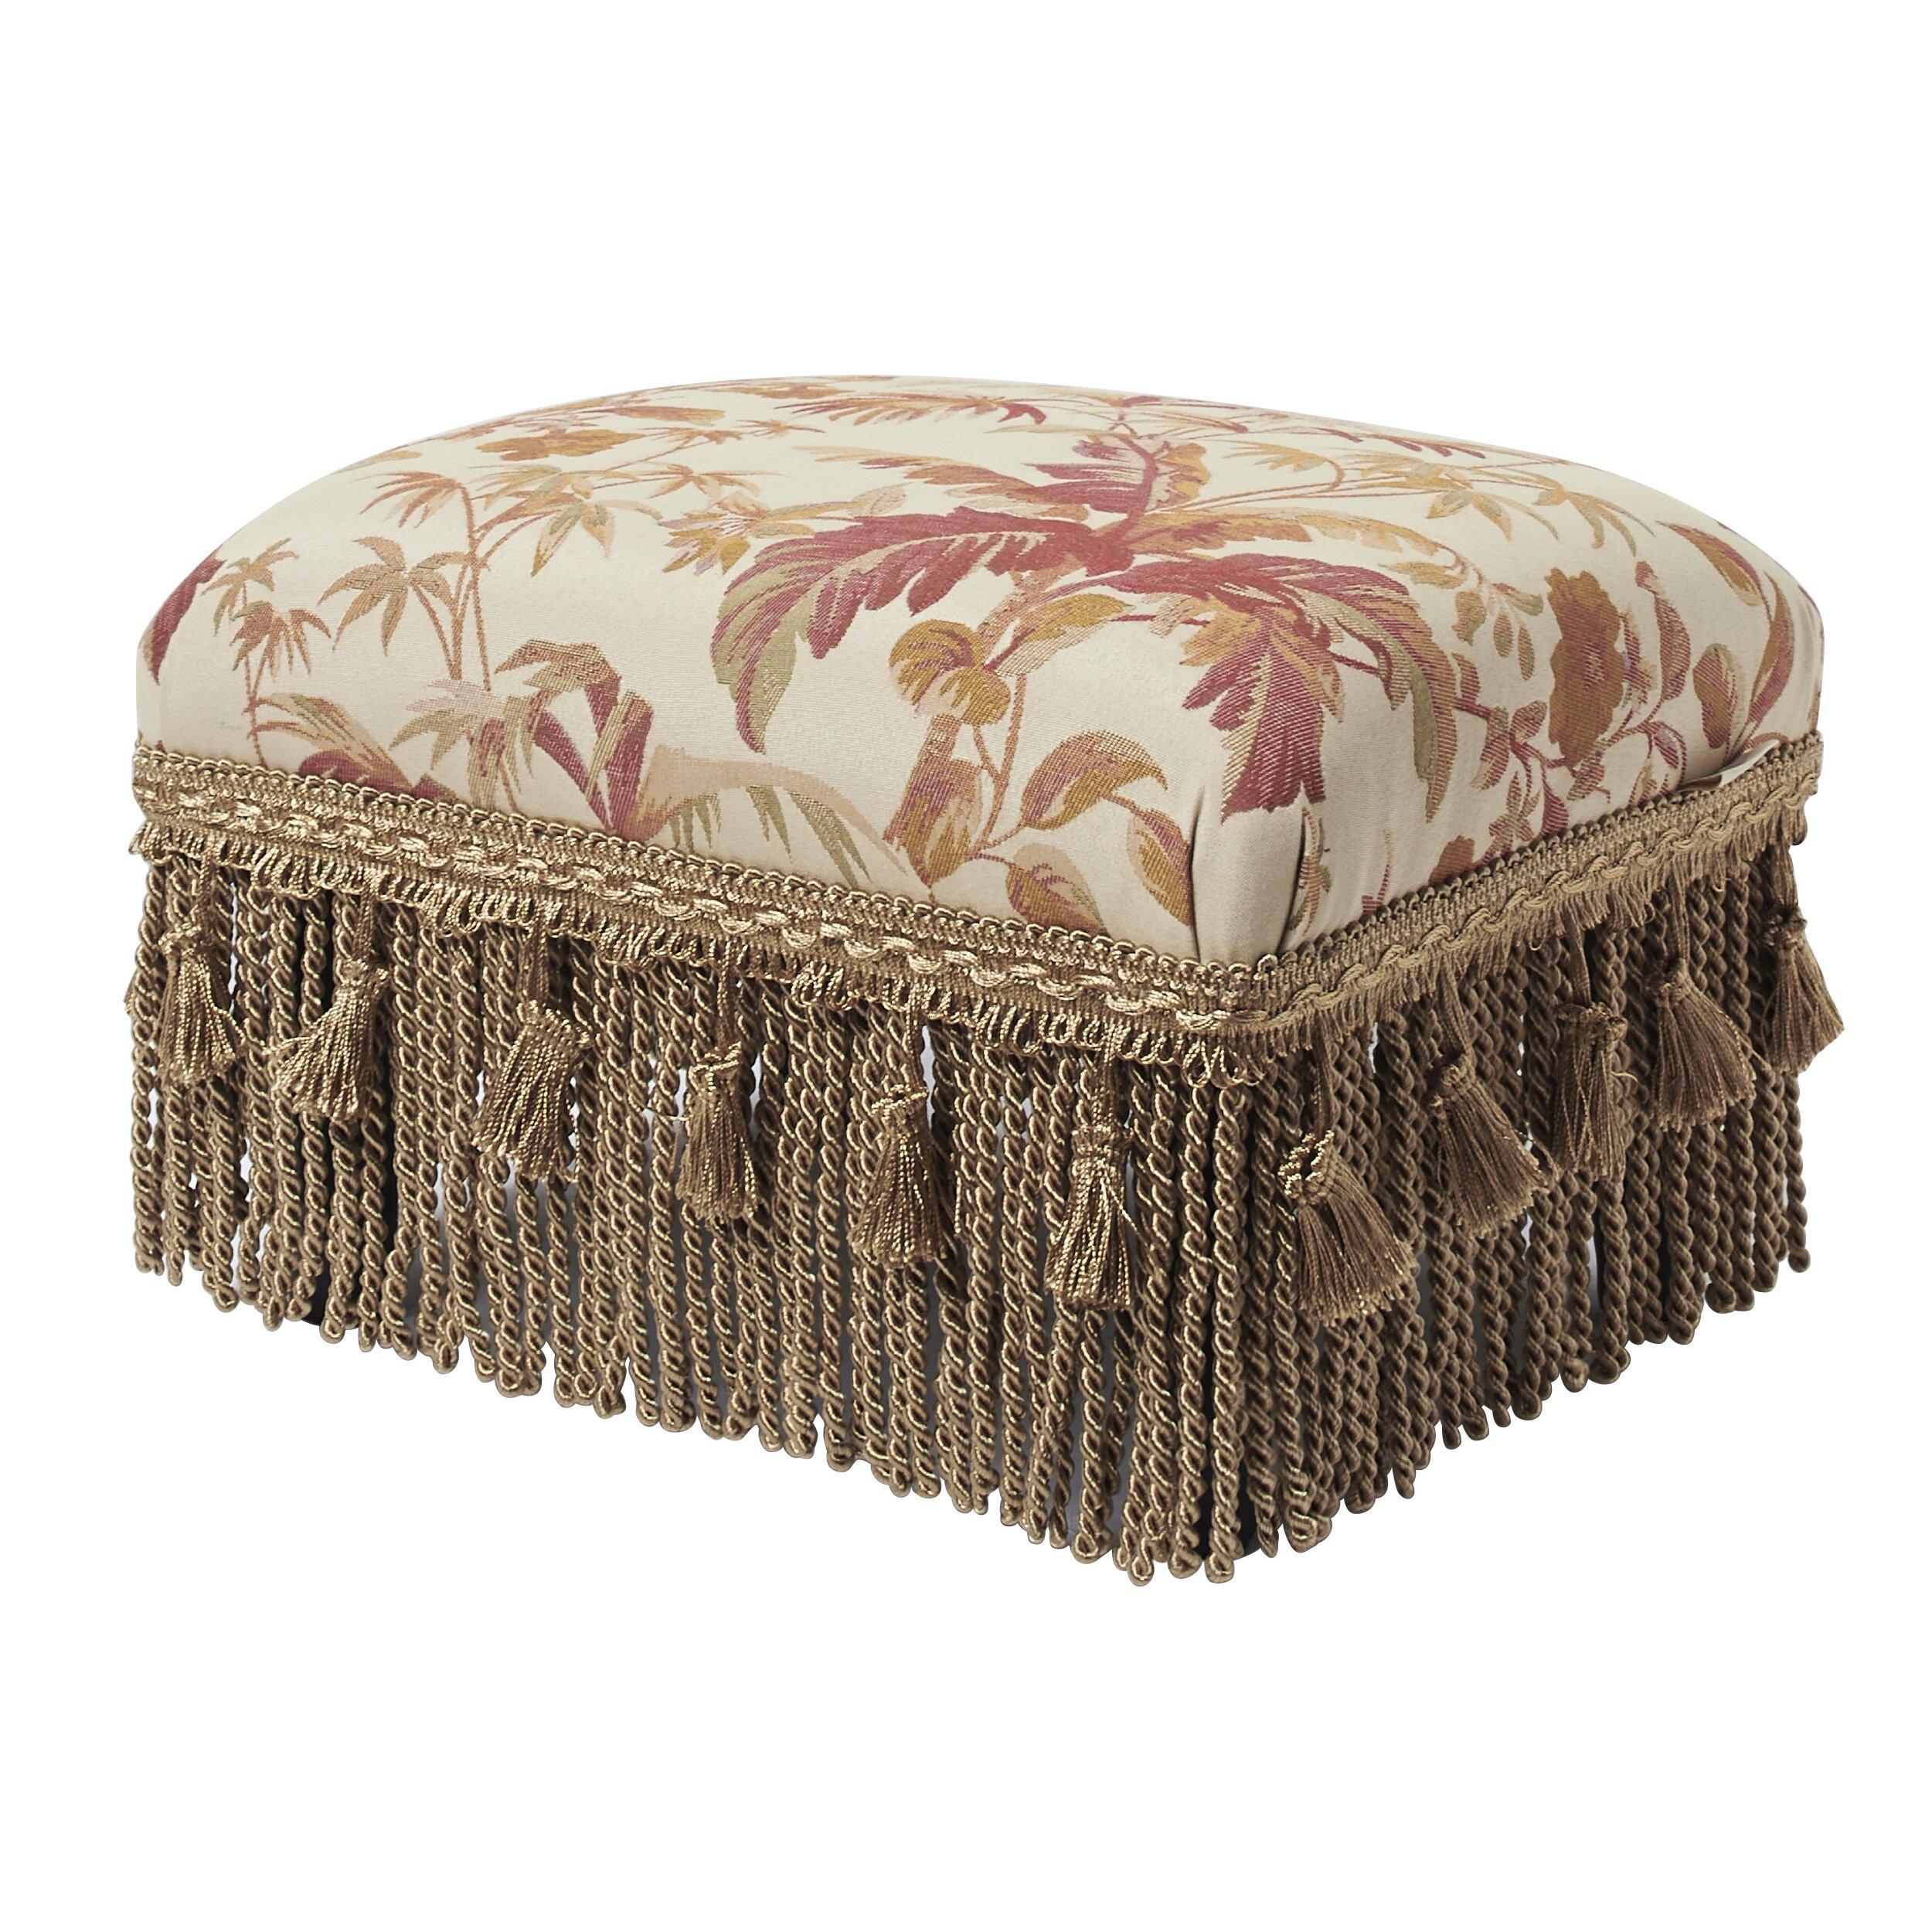 astoria grand backer ottoman reviews. Black Bedroom Furniture Sets. Home Design Ideas